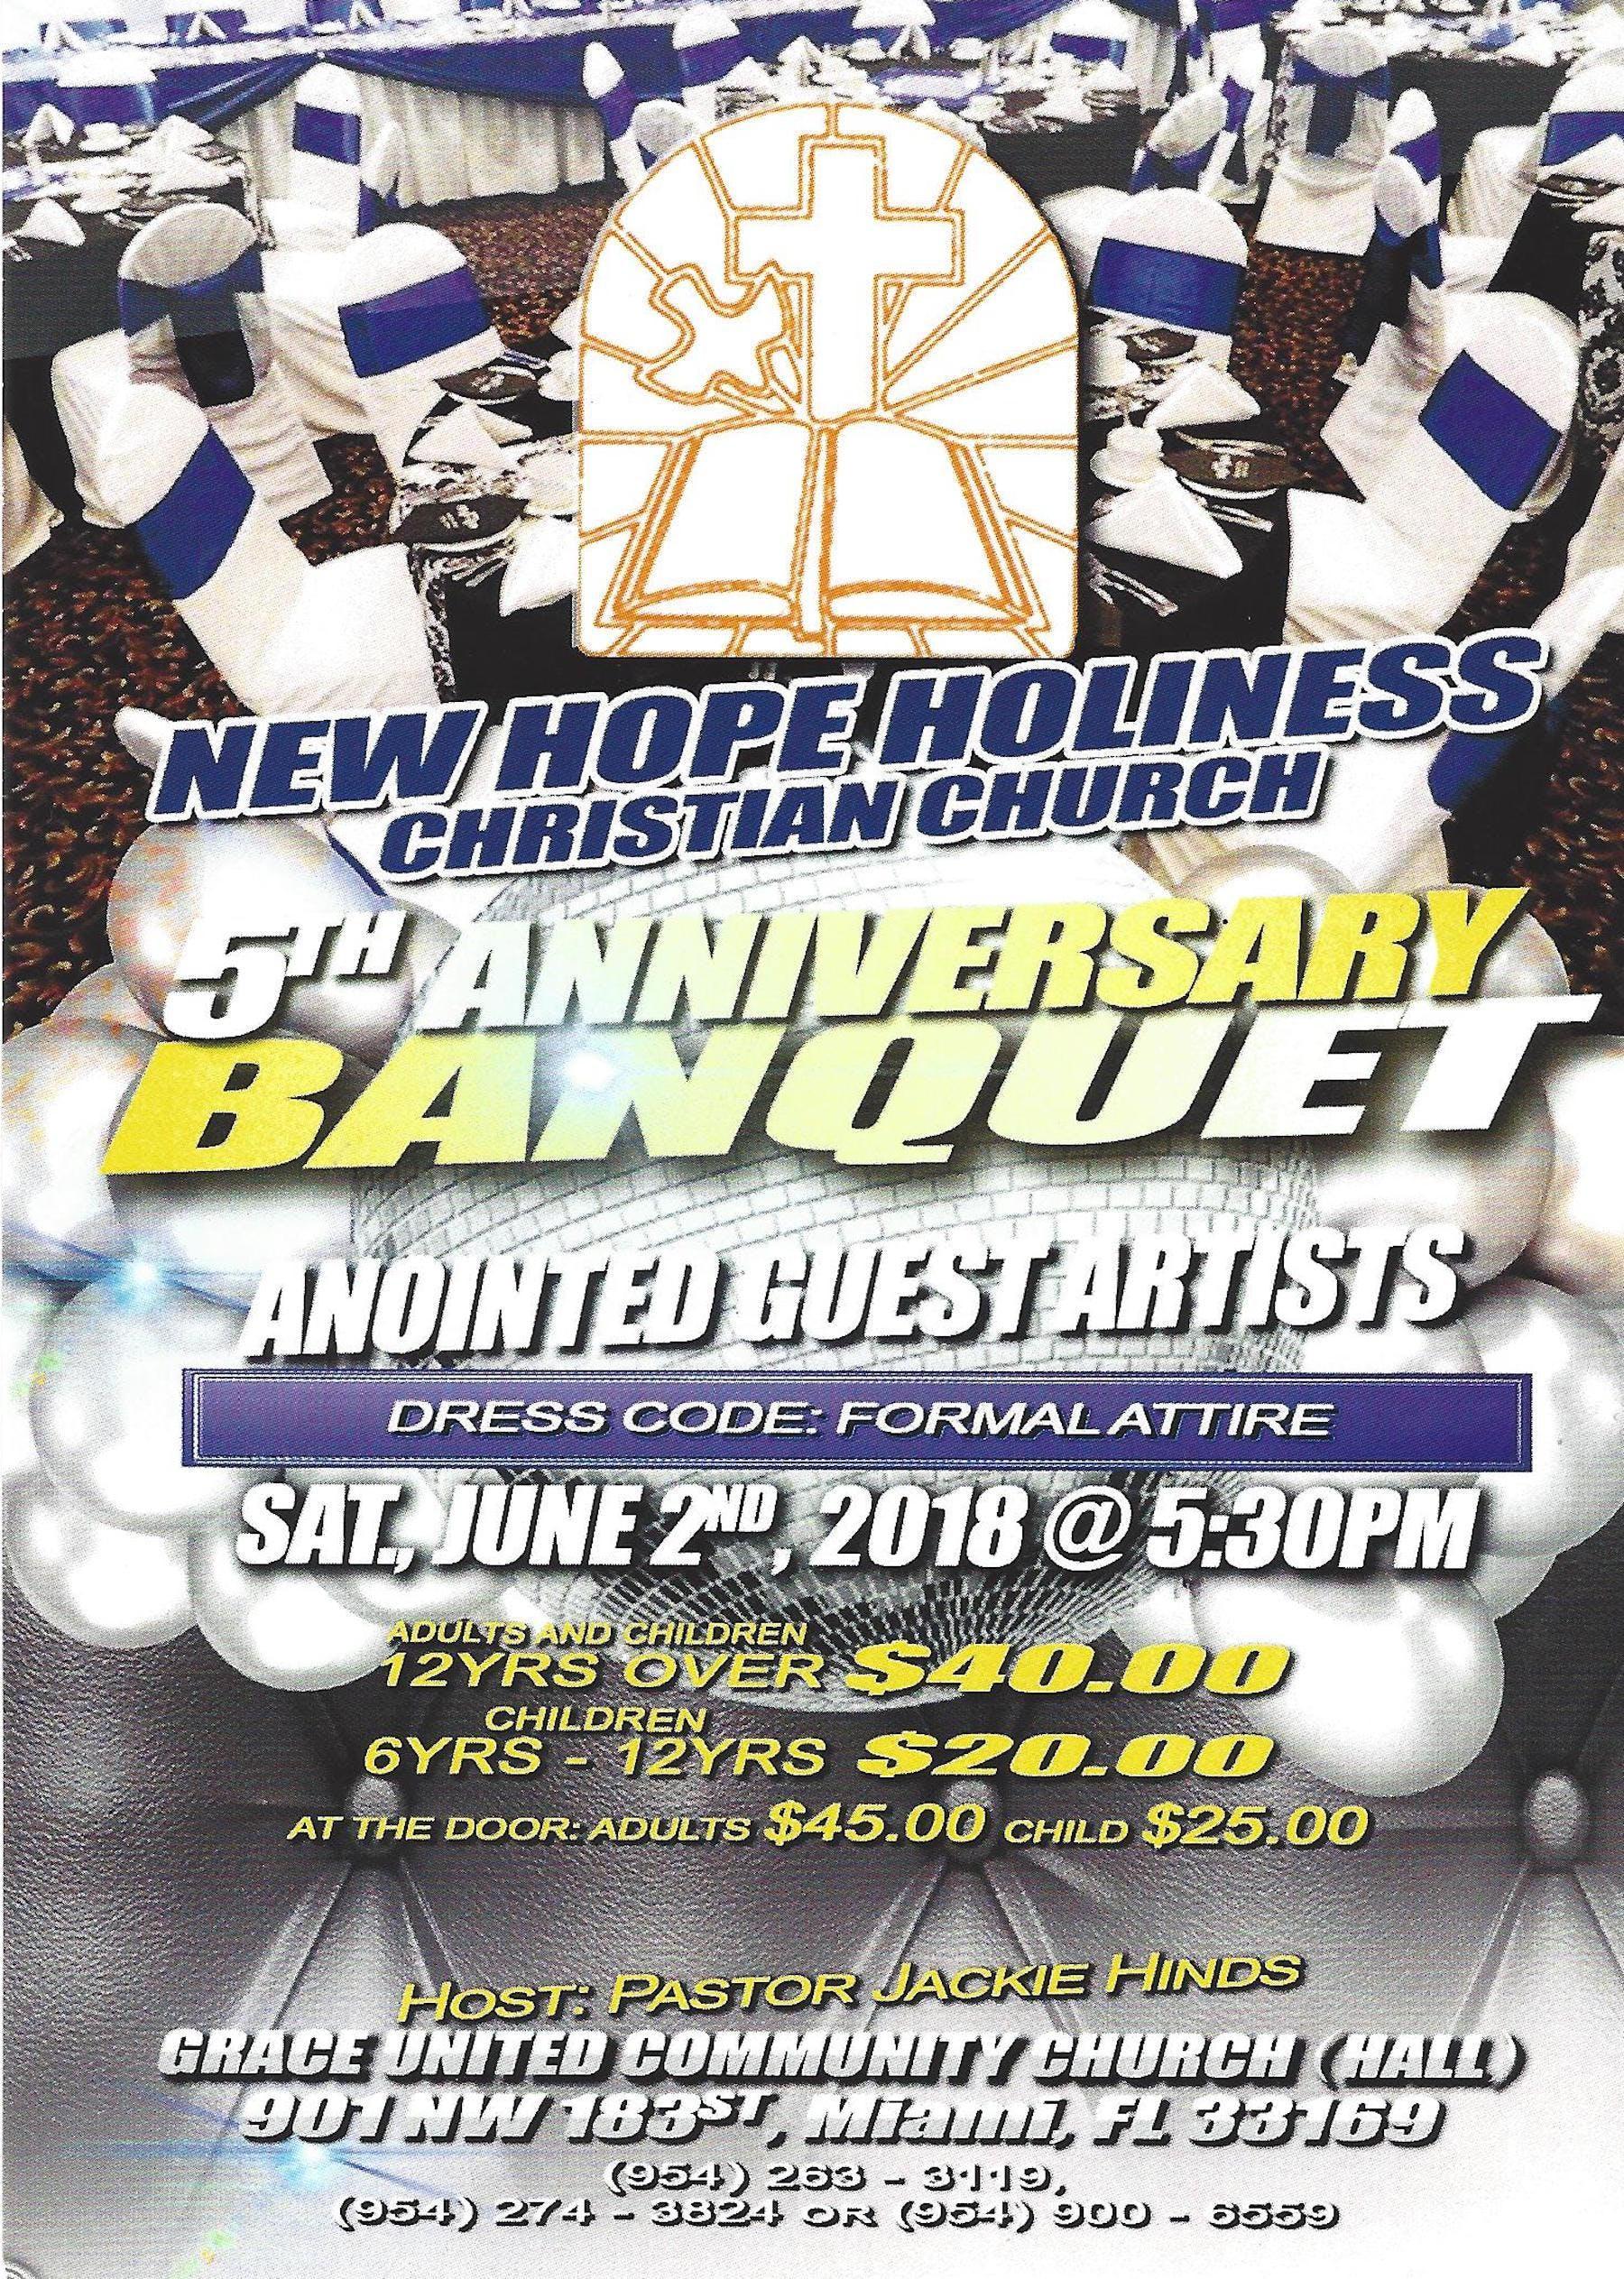 NHHCC 5th Anniversary Banquet